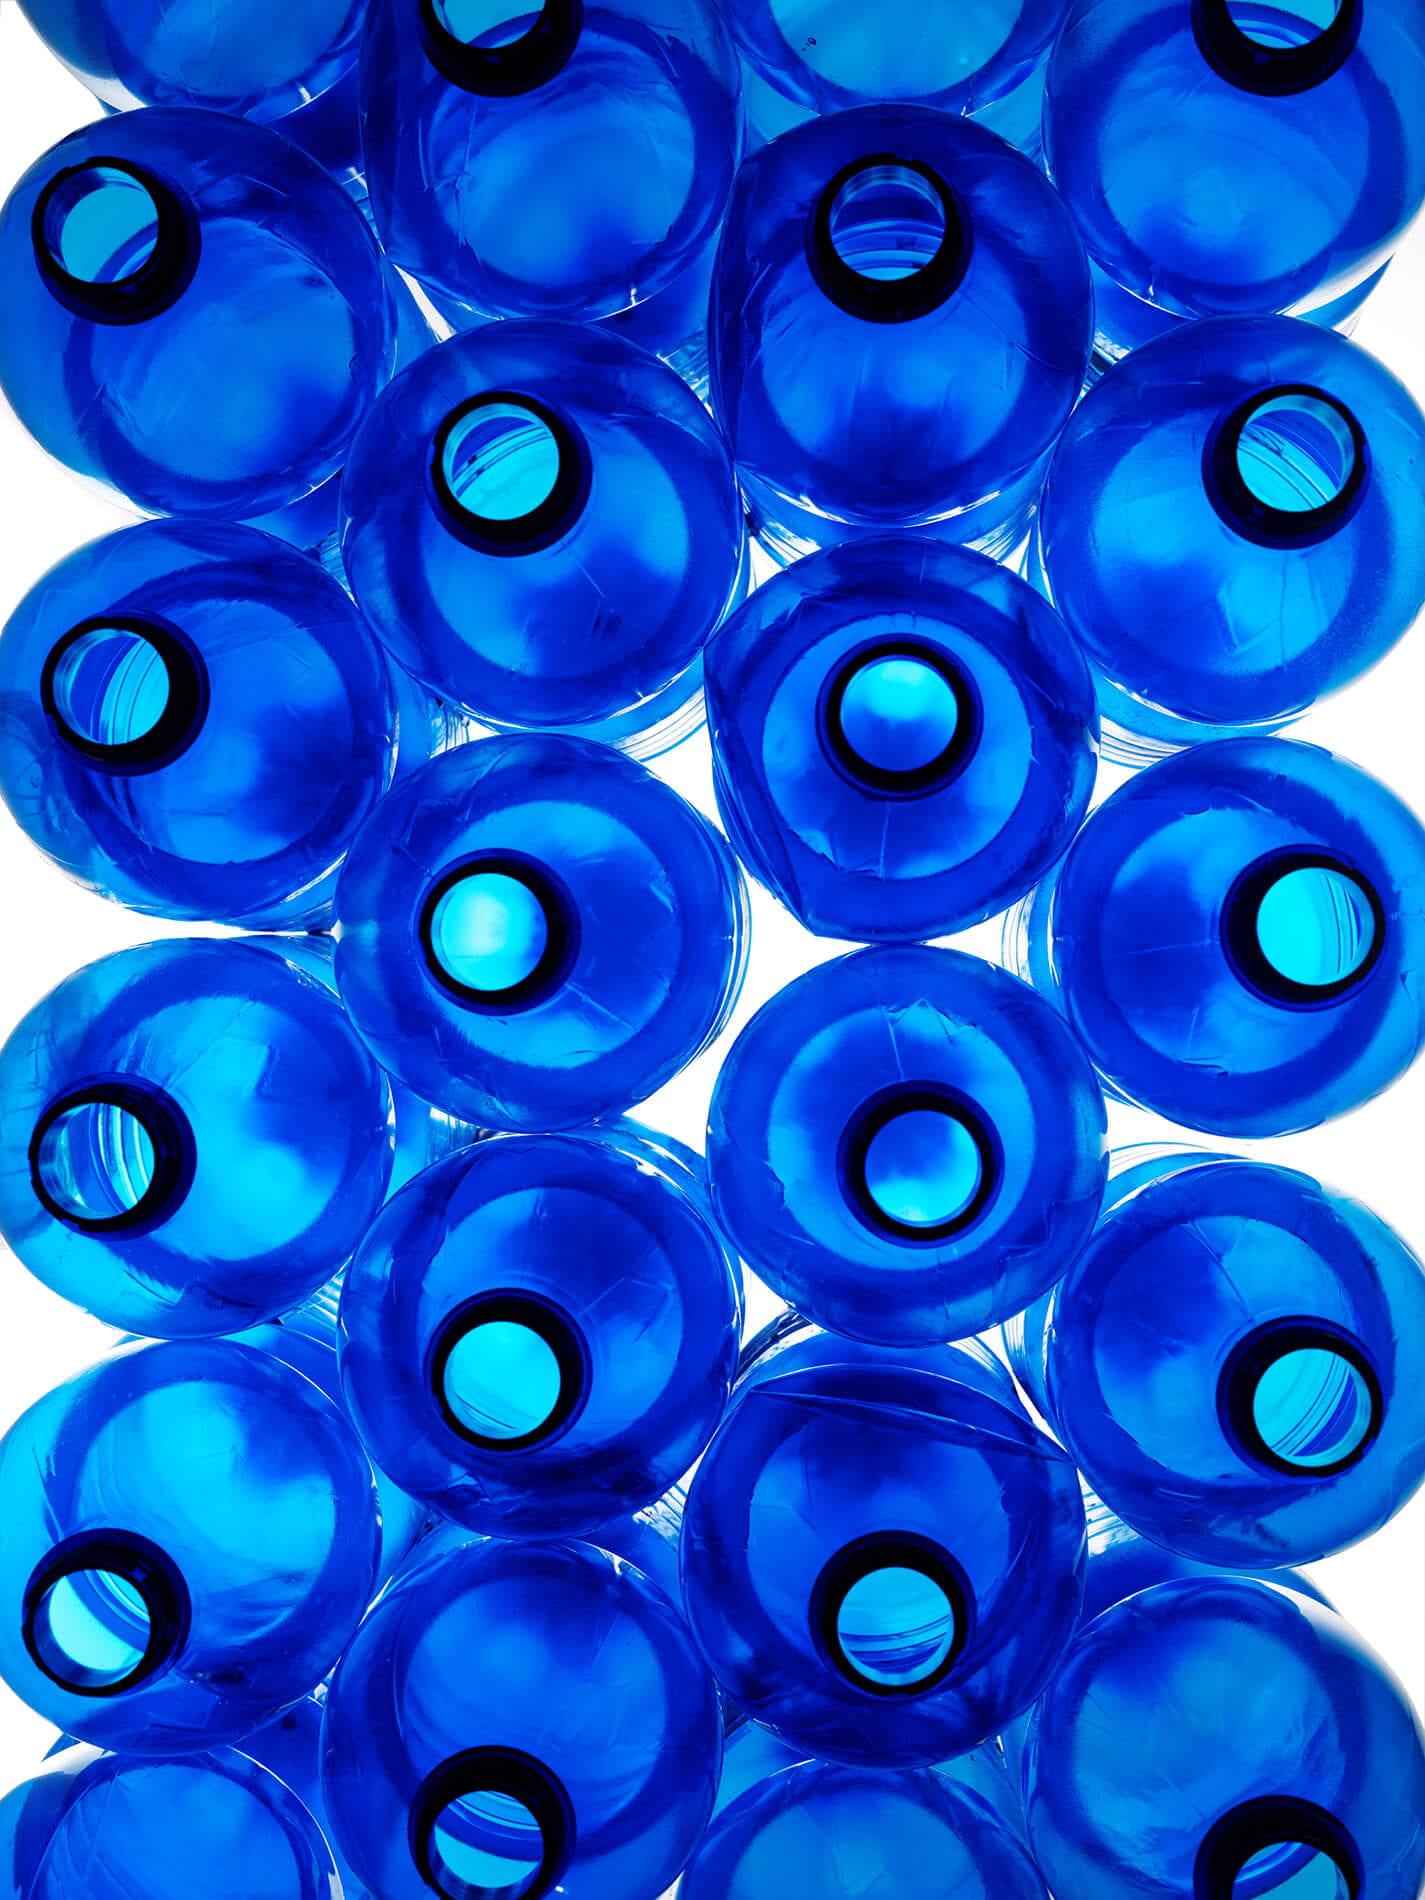 bright blue bottles